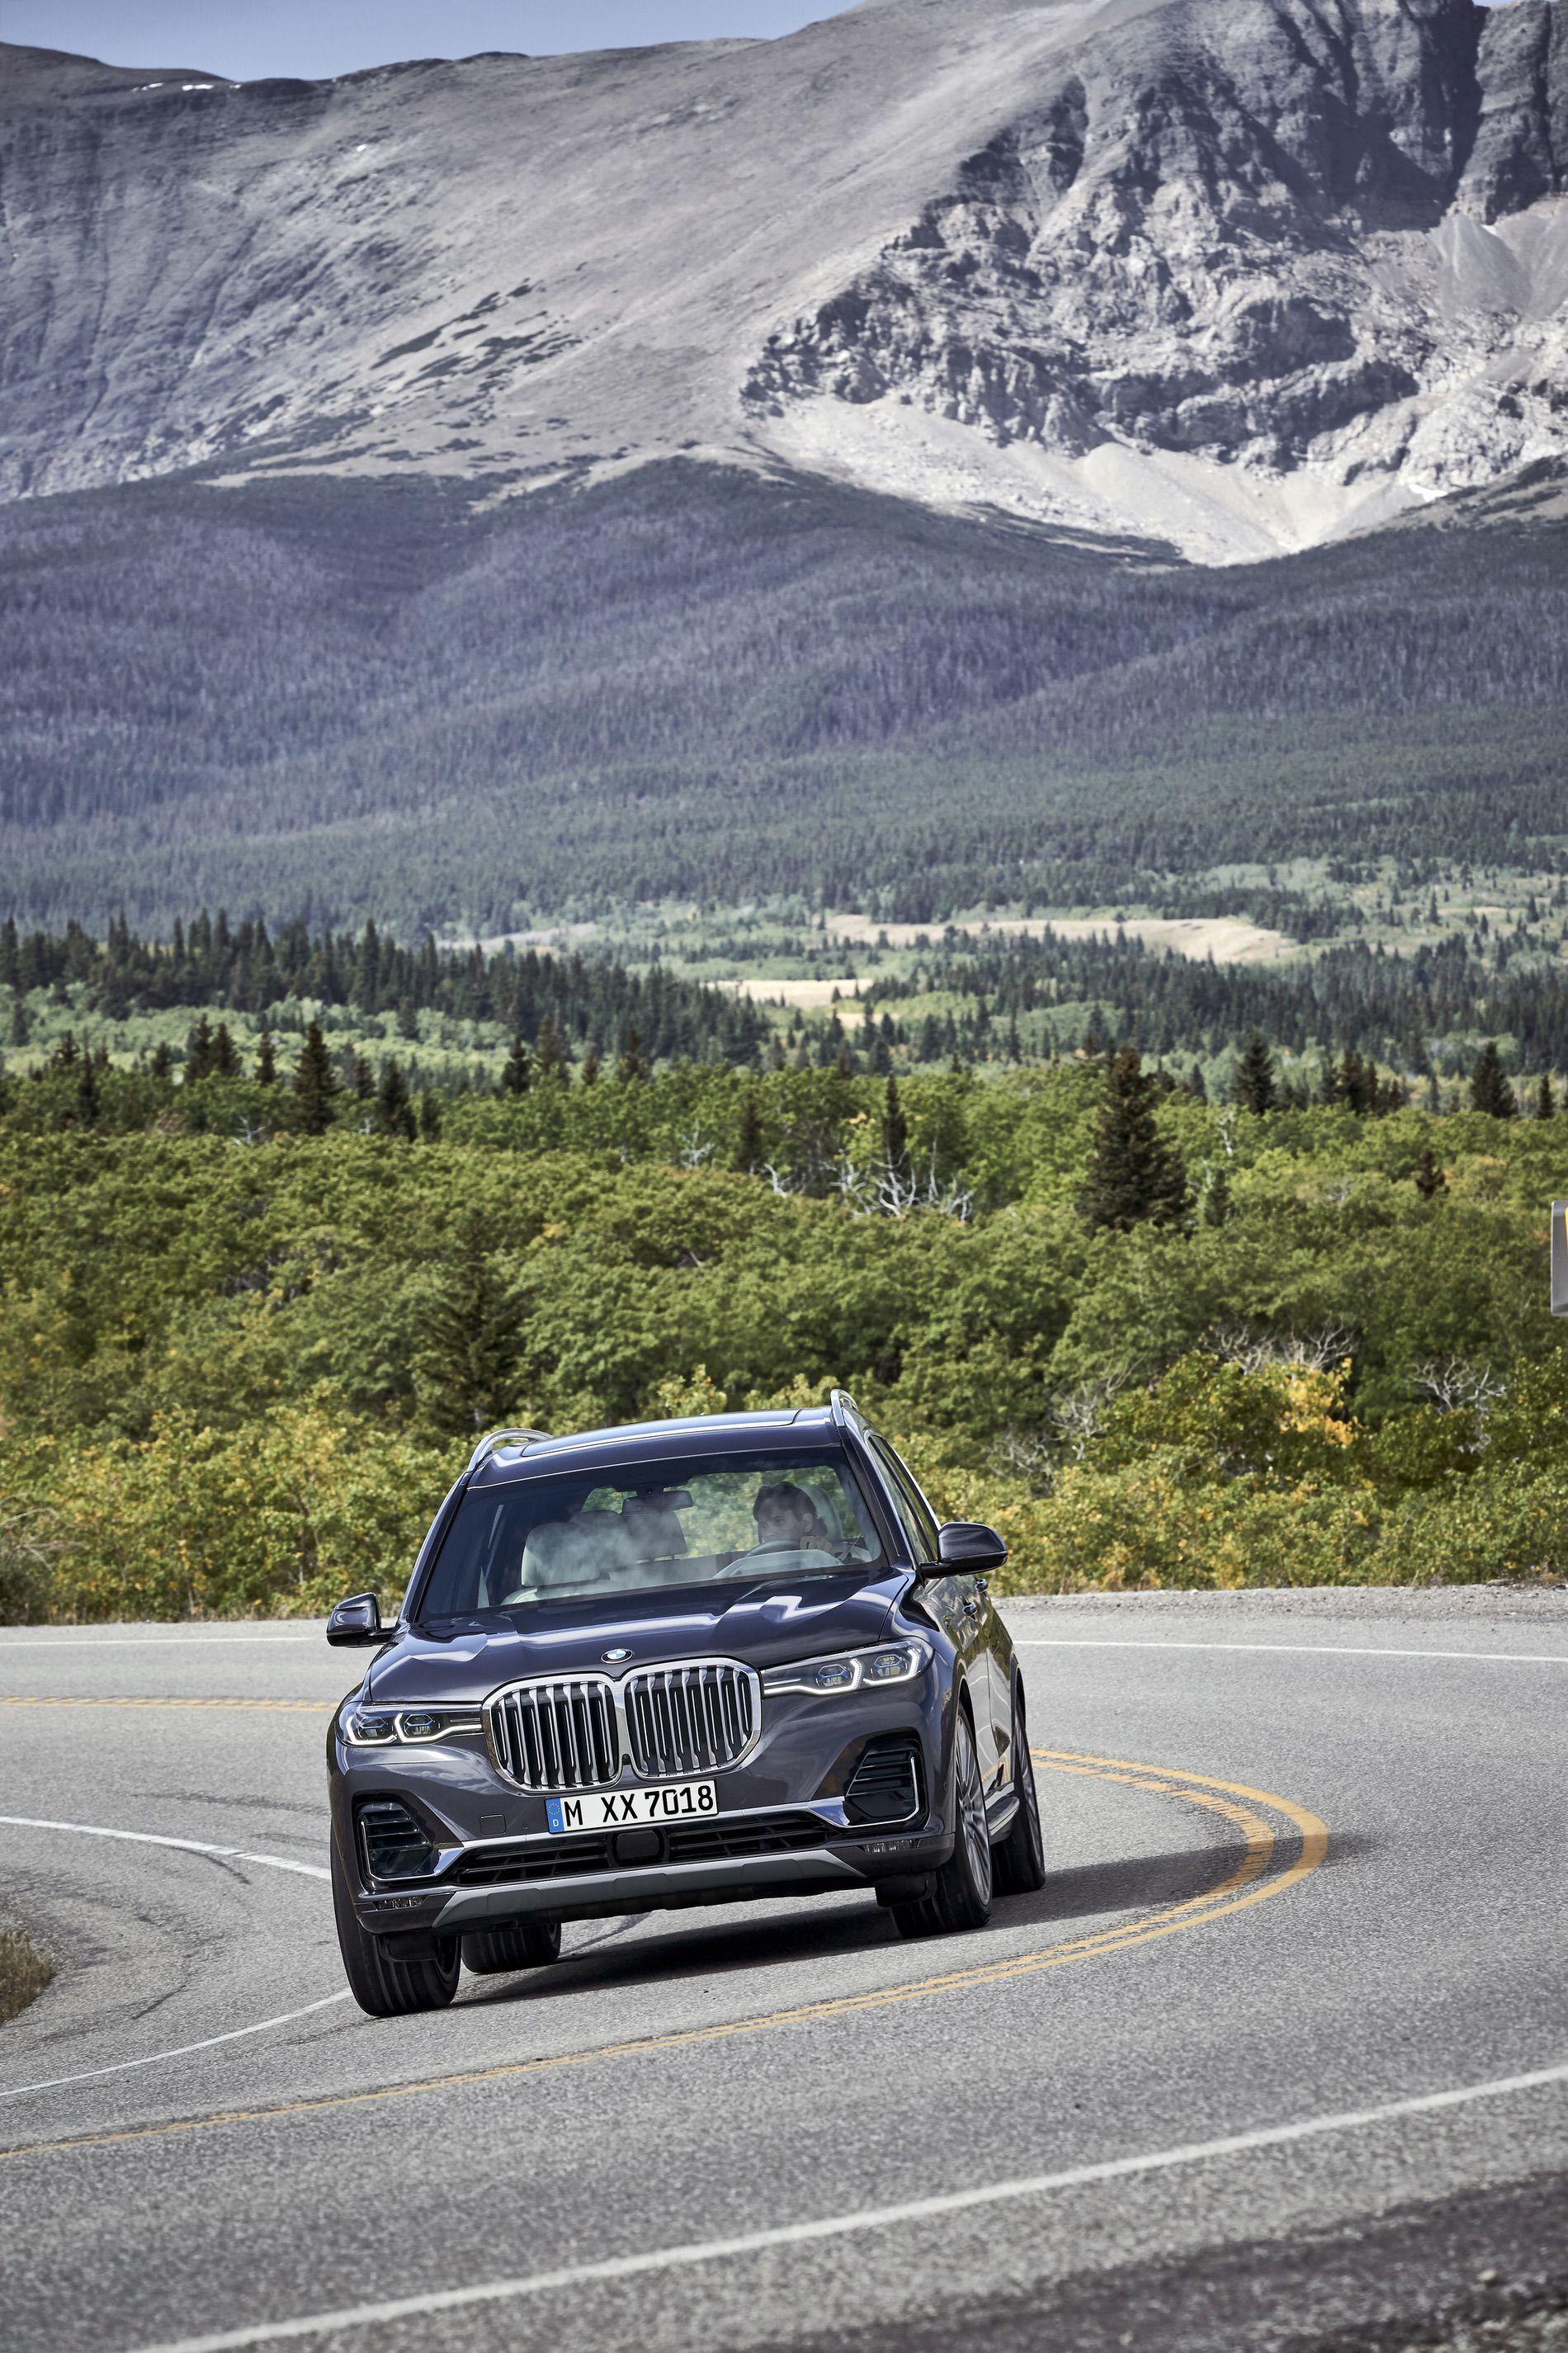 BMW X7 exterior 31